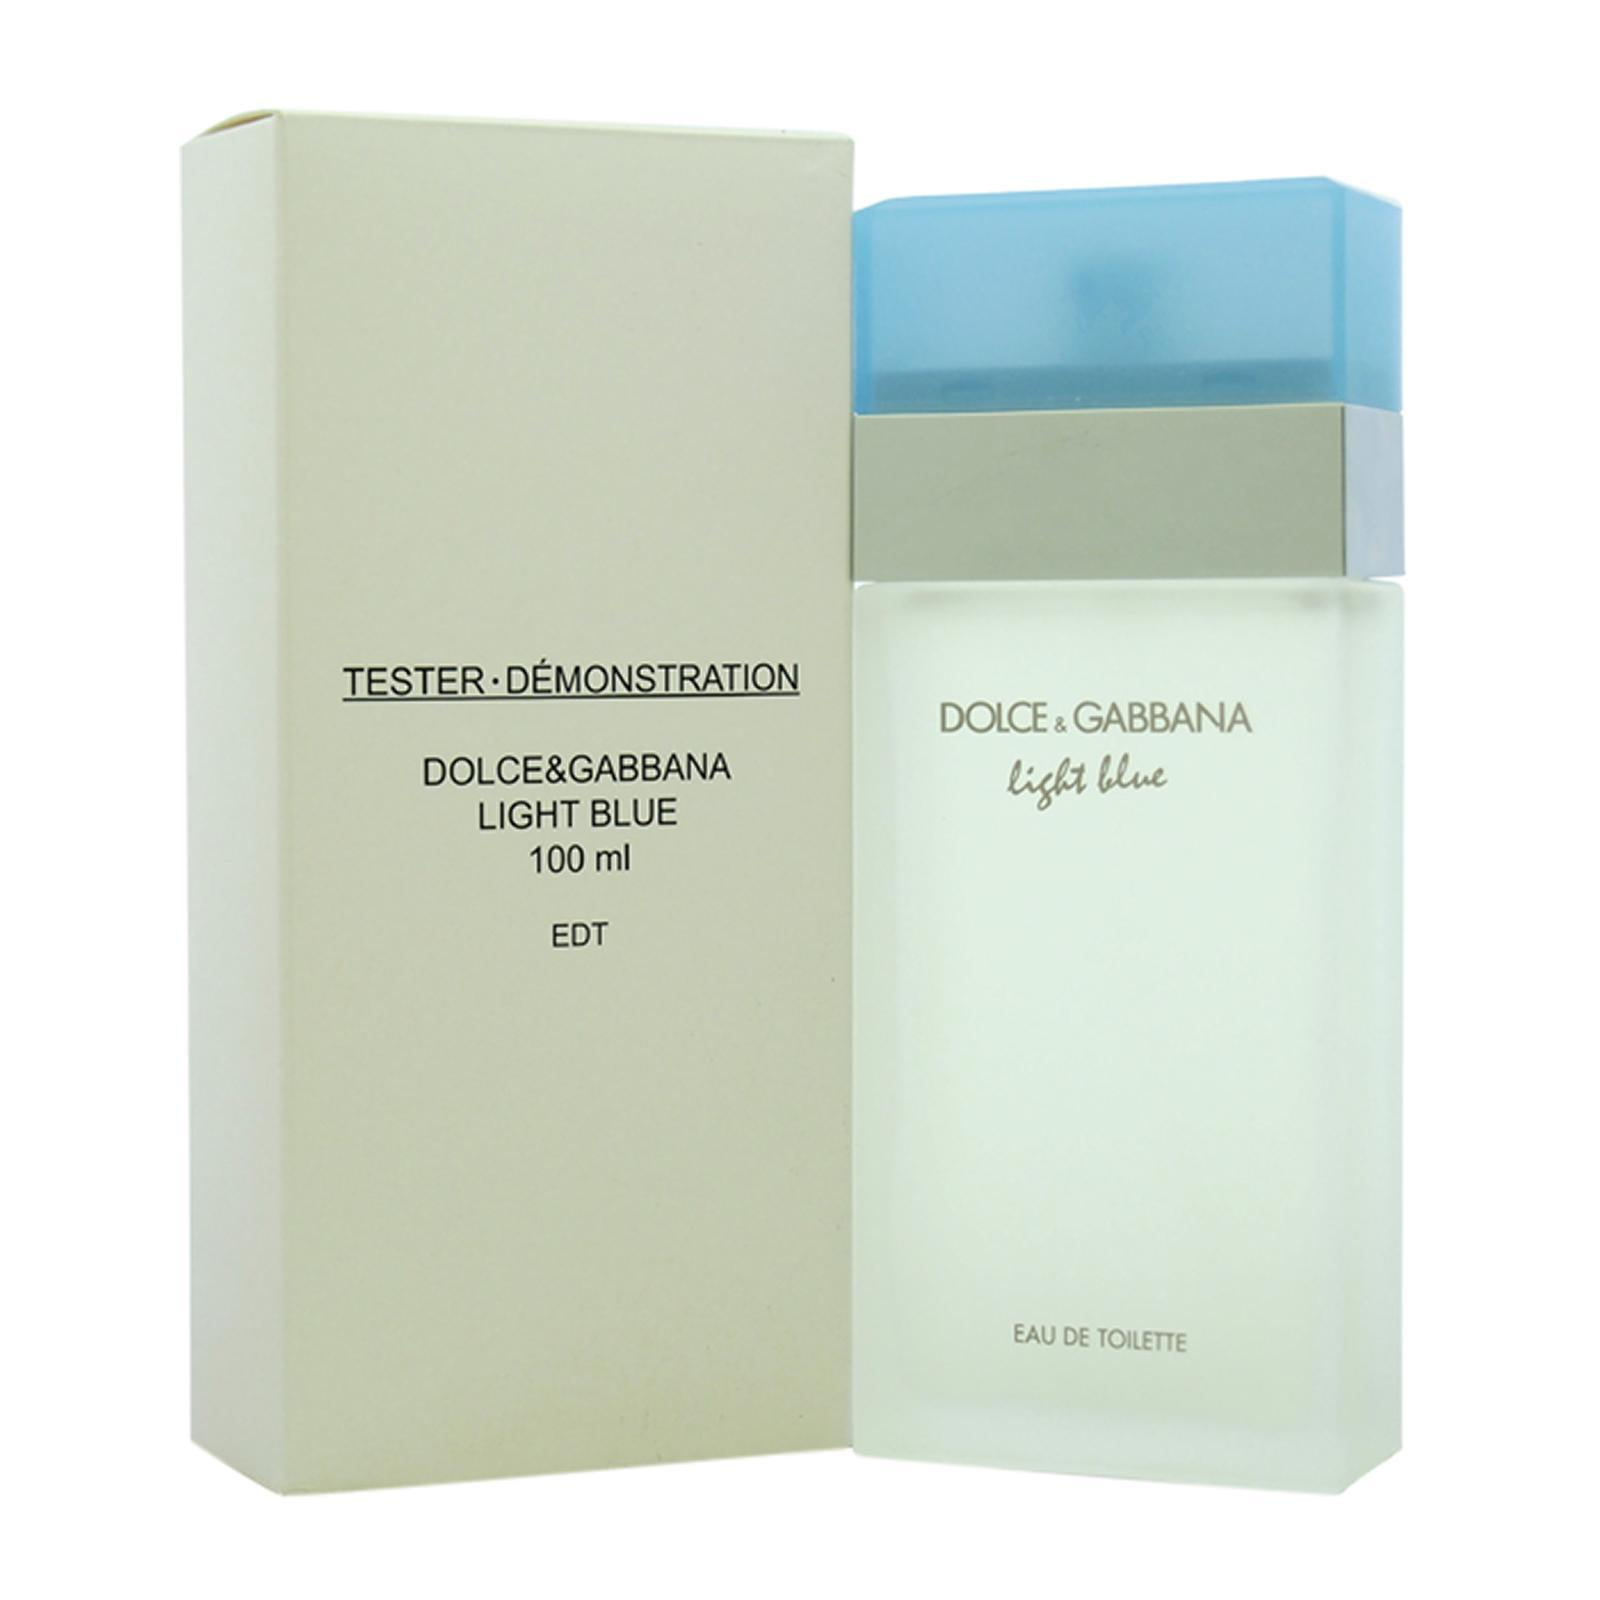 Dolce and Gabbana Light Blue For Women Eau De Toilette Perfume Fragrance Spray Tester - By BEAULUXLAB